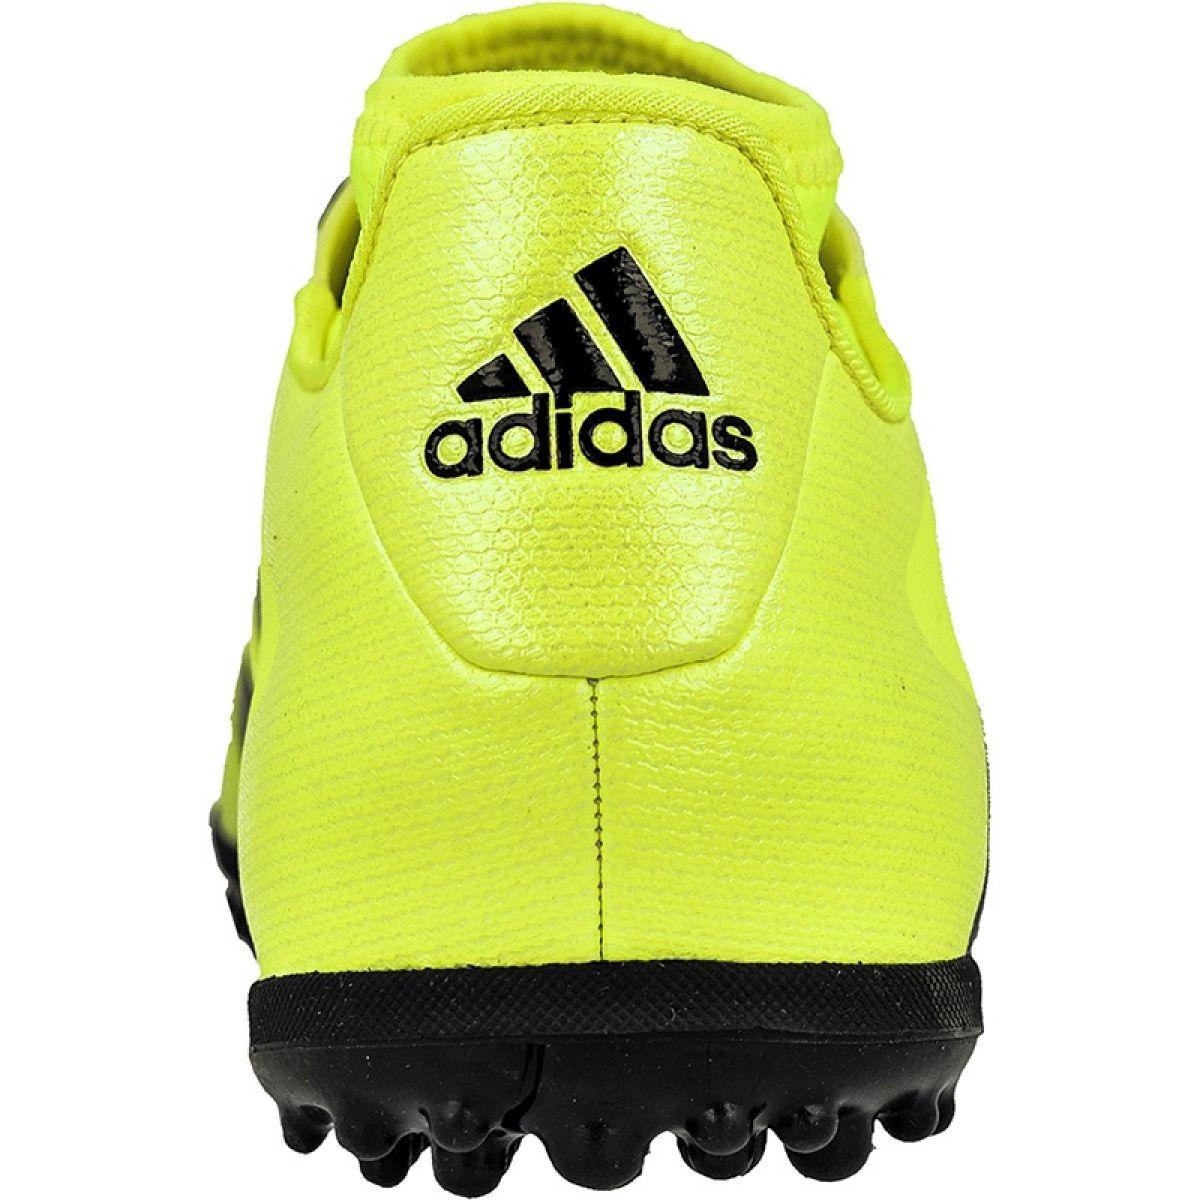 size 40 1abfb a5816 Football boots adidas Ace 16.3 Primemesh Tf M AQ3429